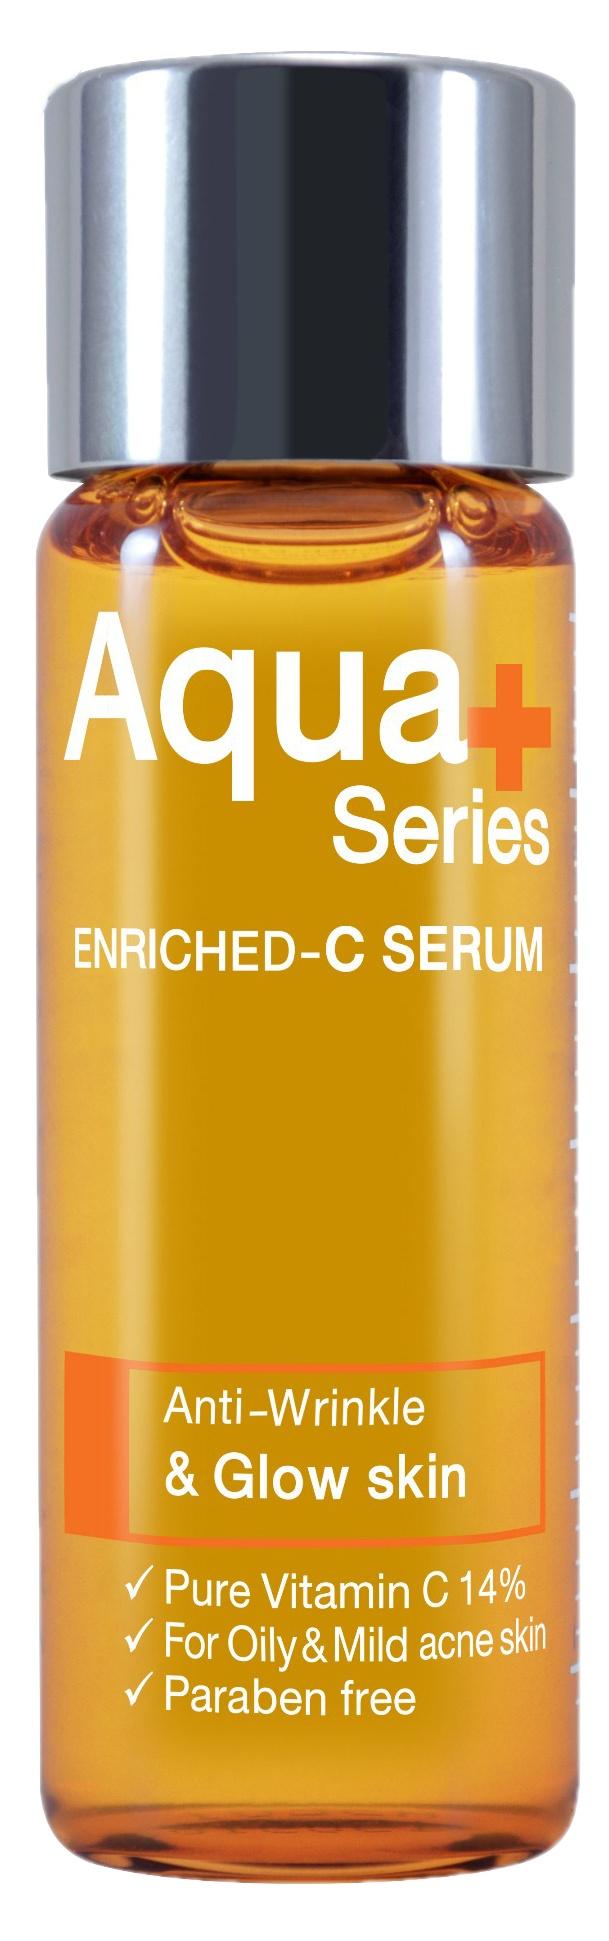 Aqua + Series Enriched- C Serum